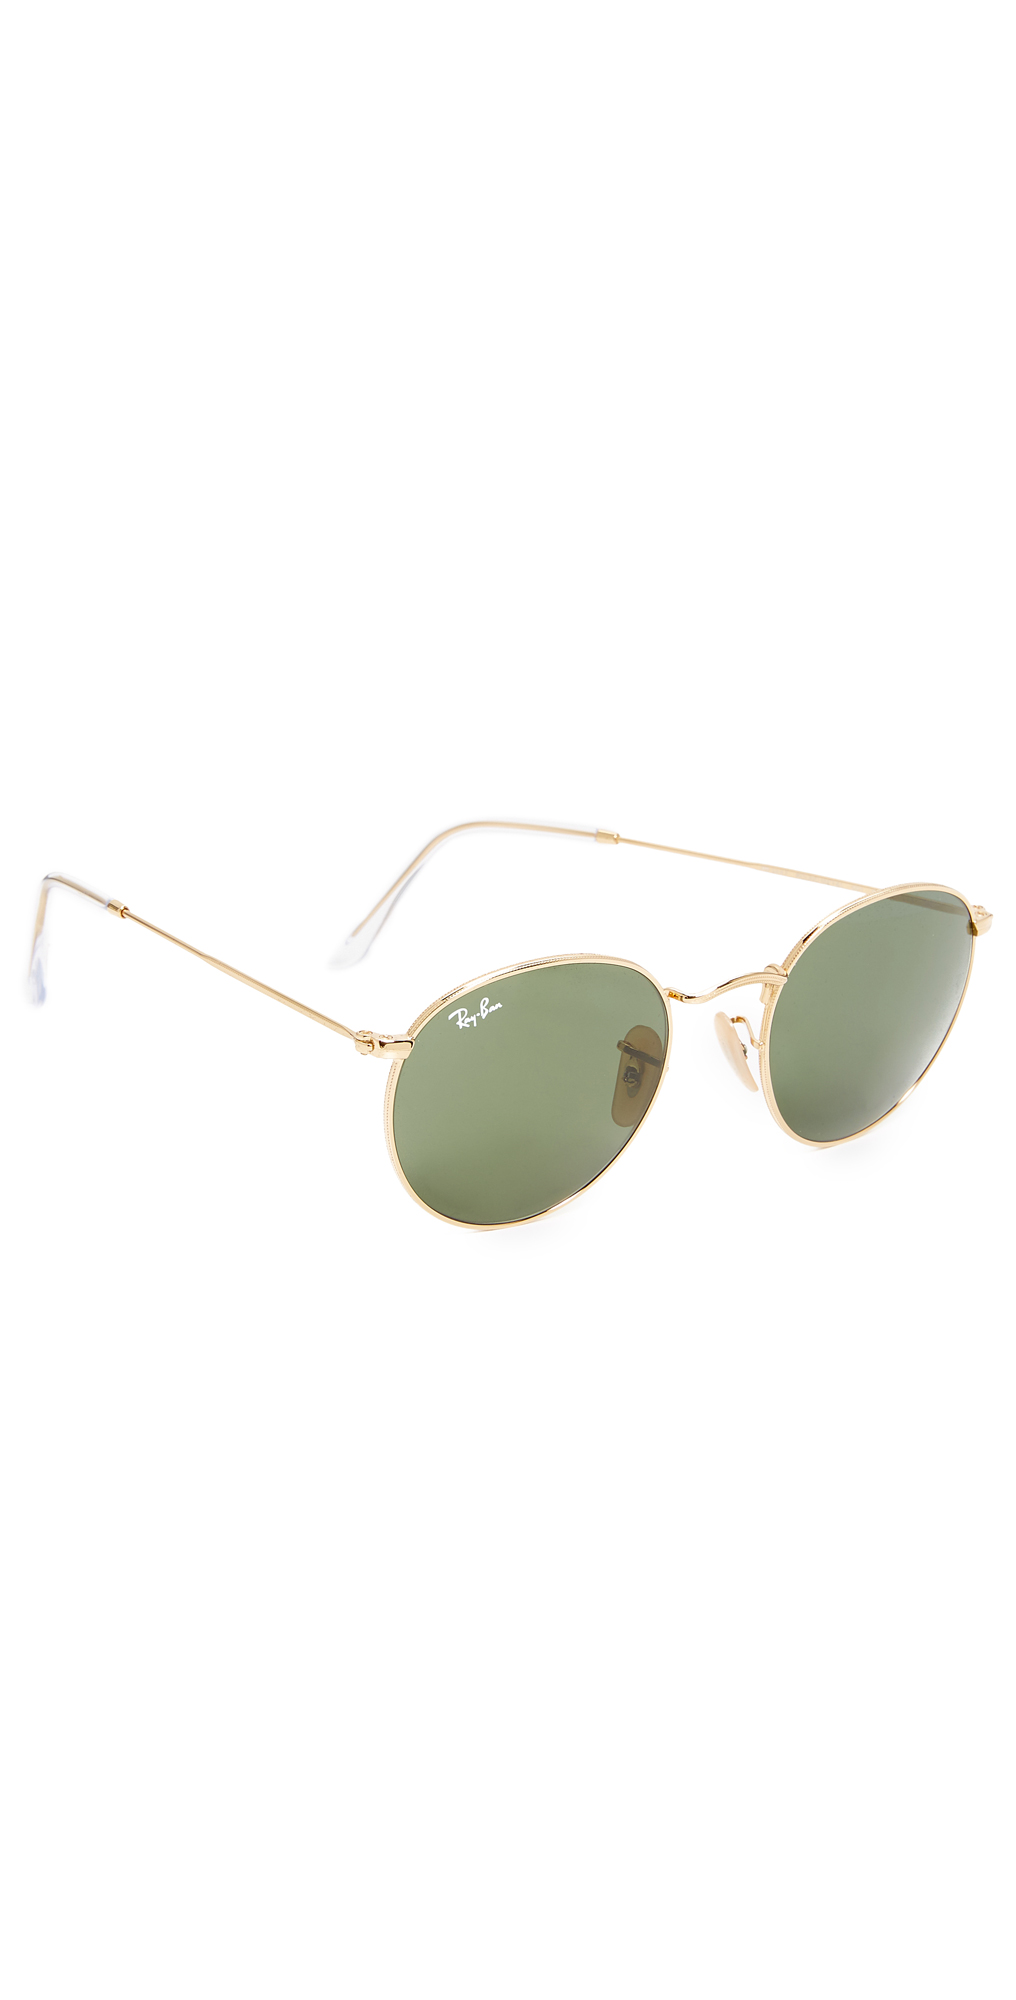 Phantos Round Sunglasses Ray-Ban